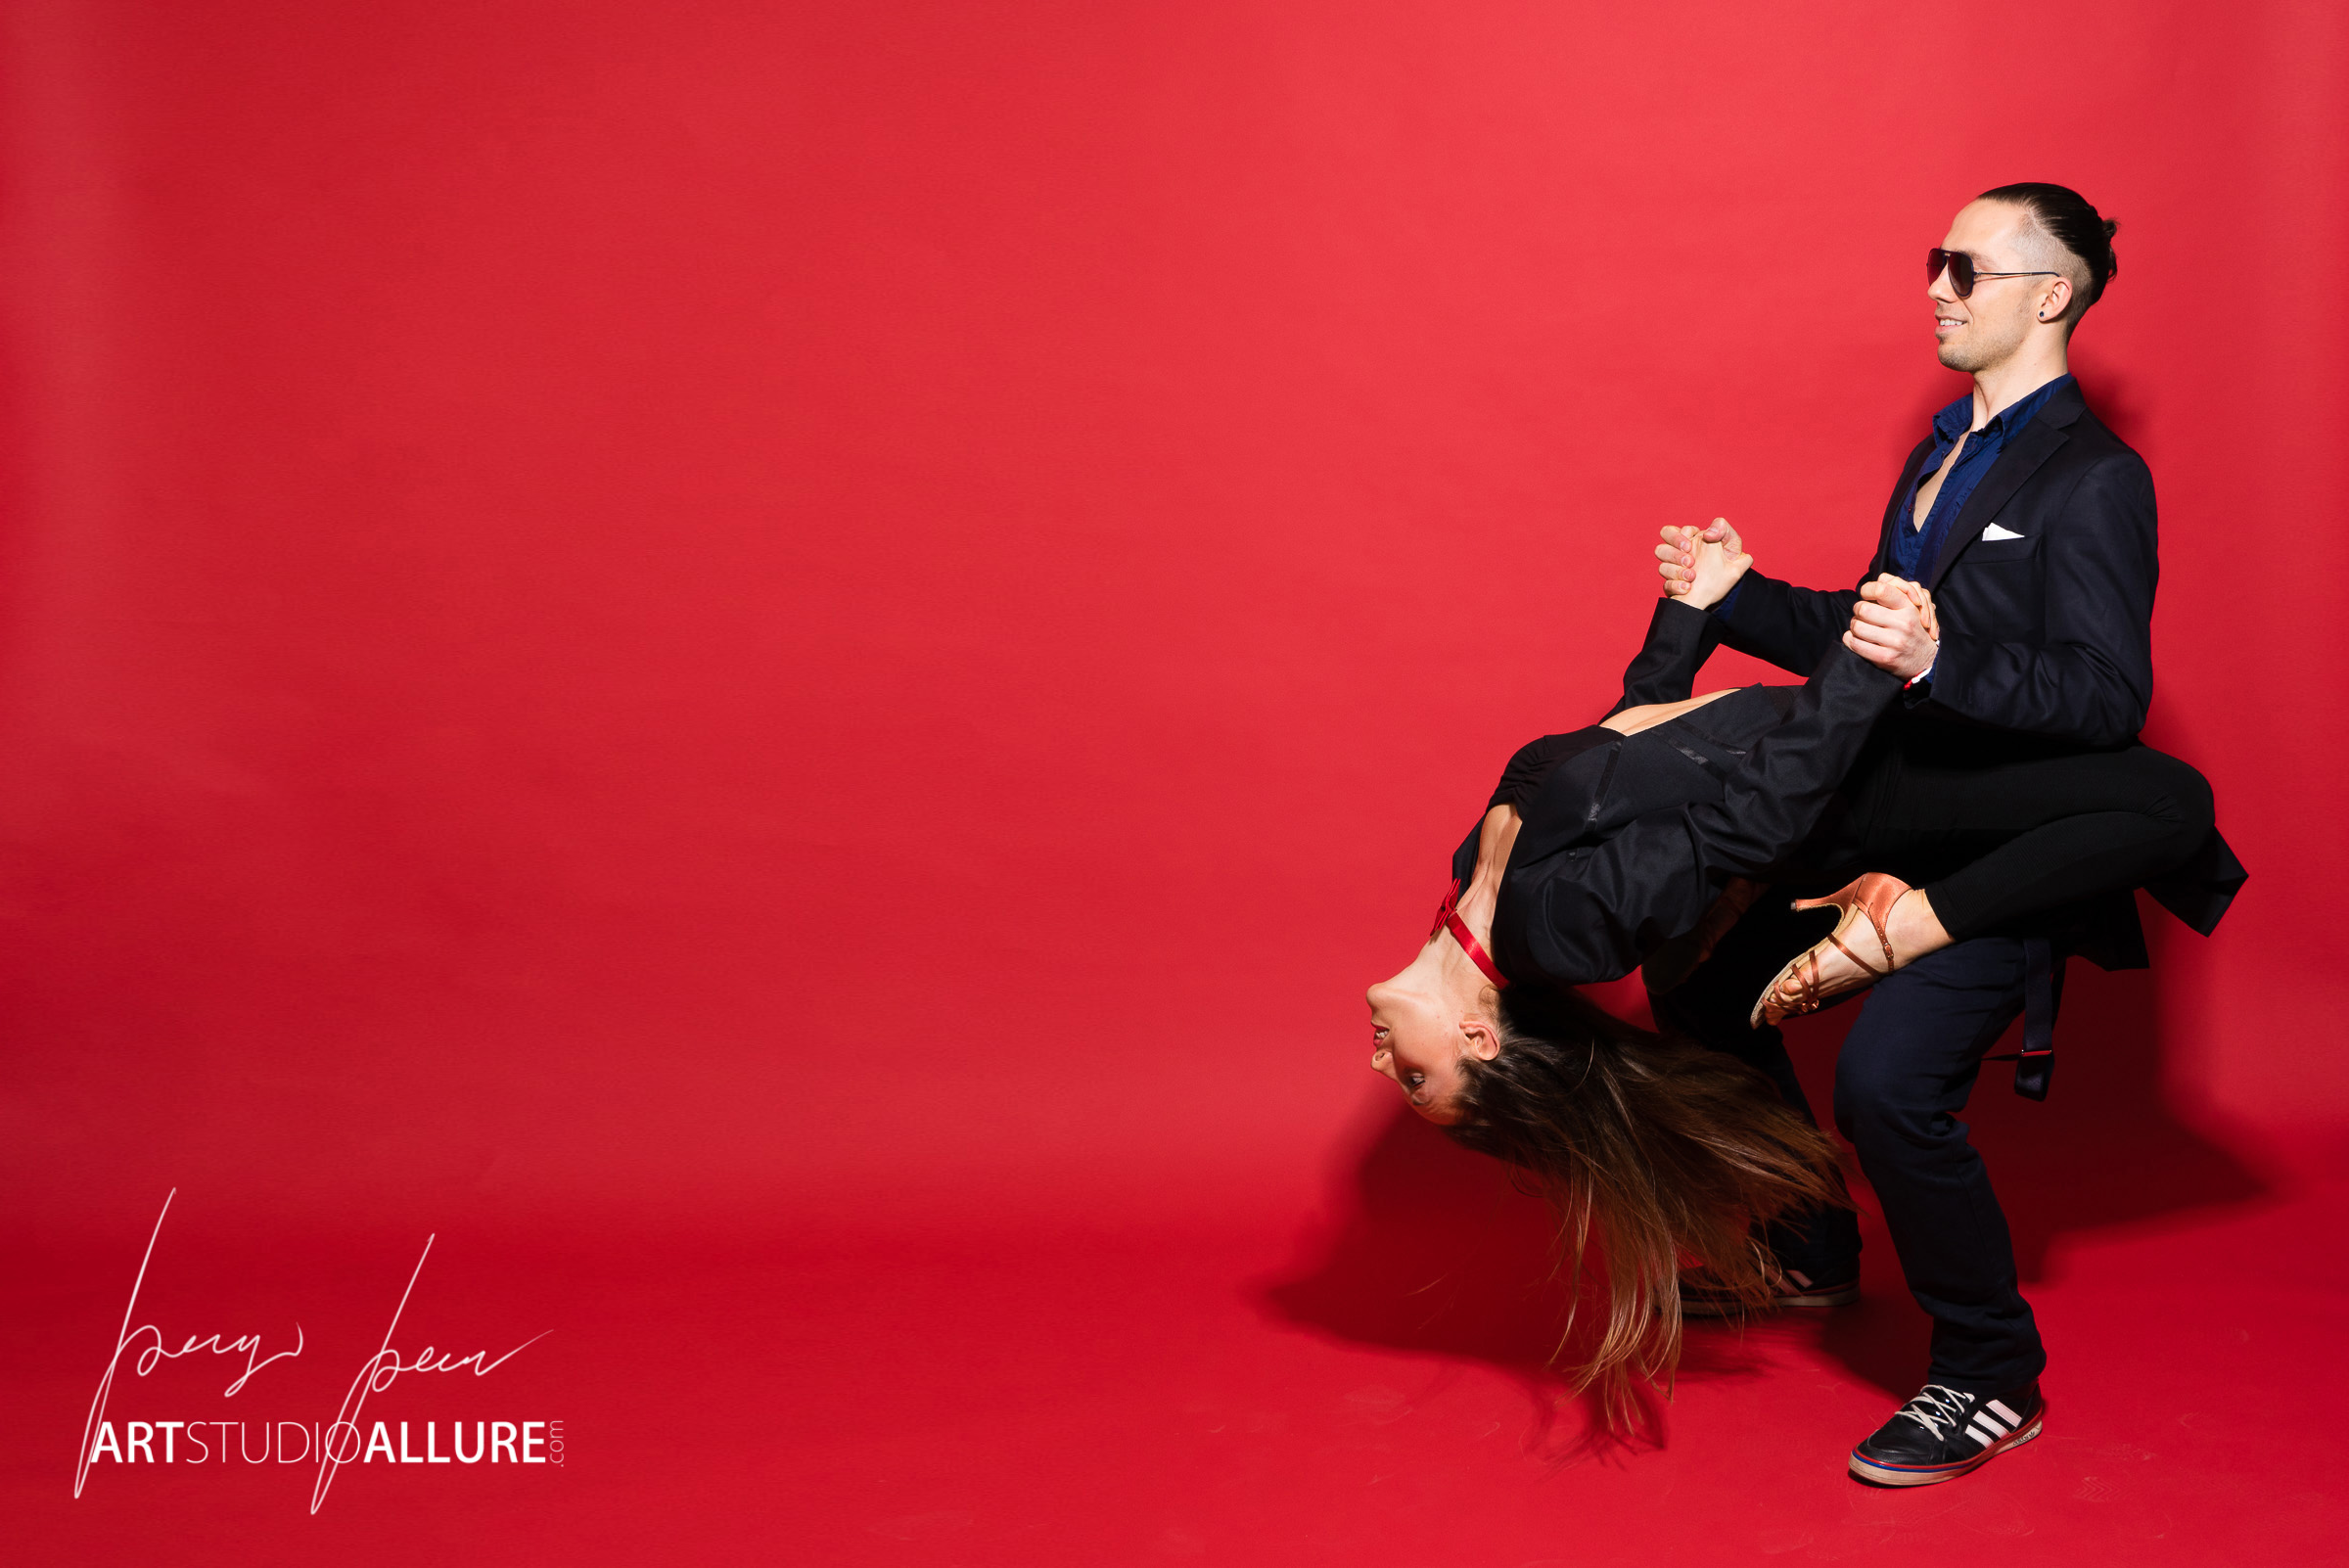 Photographer: Peyo Peev   Models: Teodora Kaloyanova and Dimitar Kirkov    Assistant: Dimo Peev   At Salsa Ritmo Dance Studio